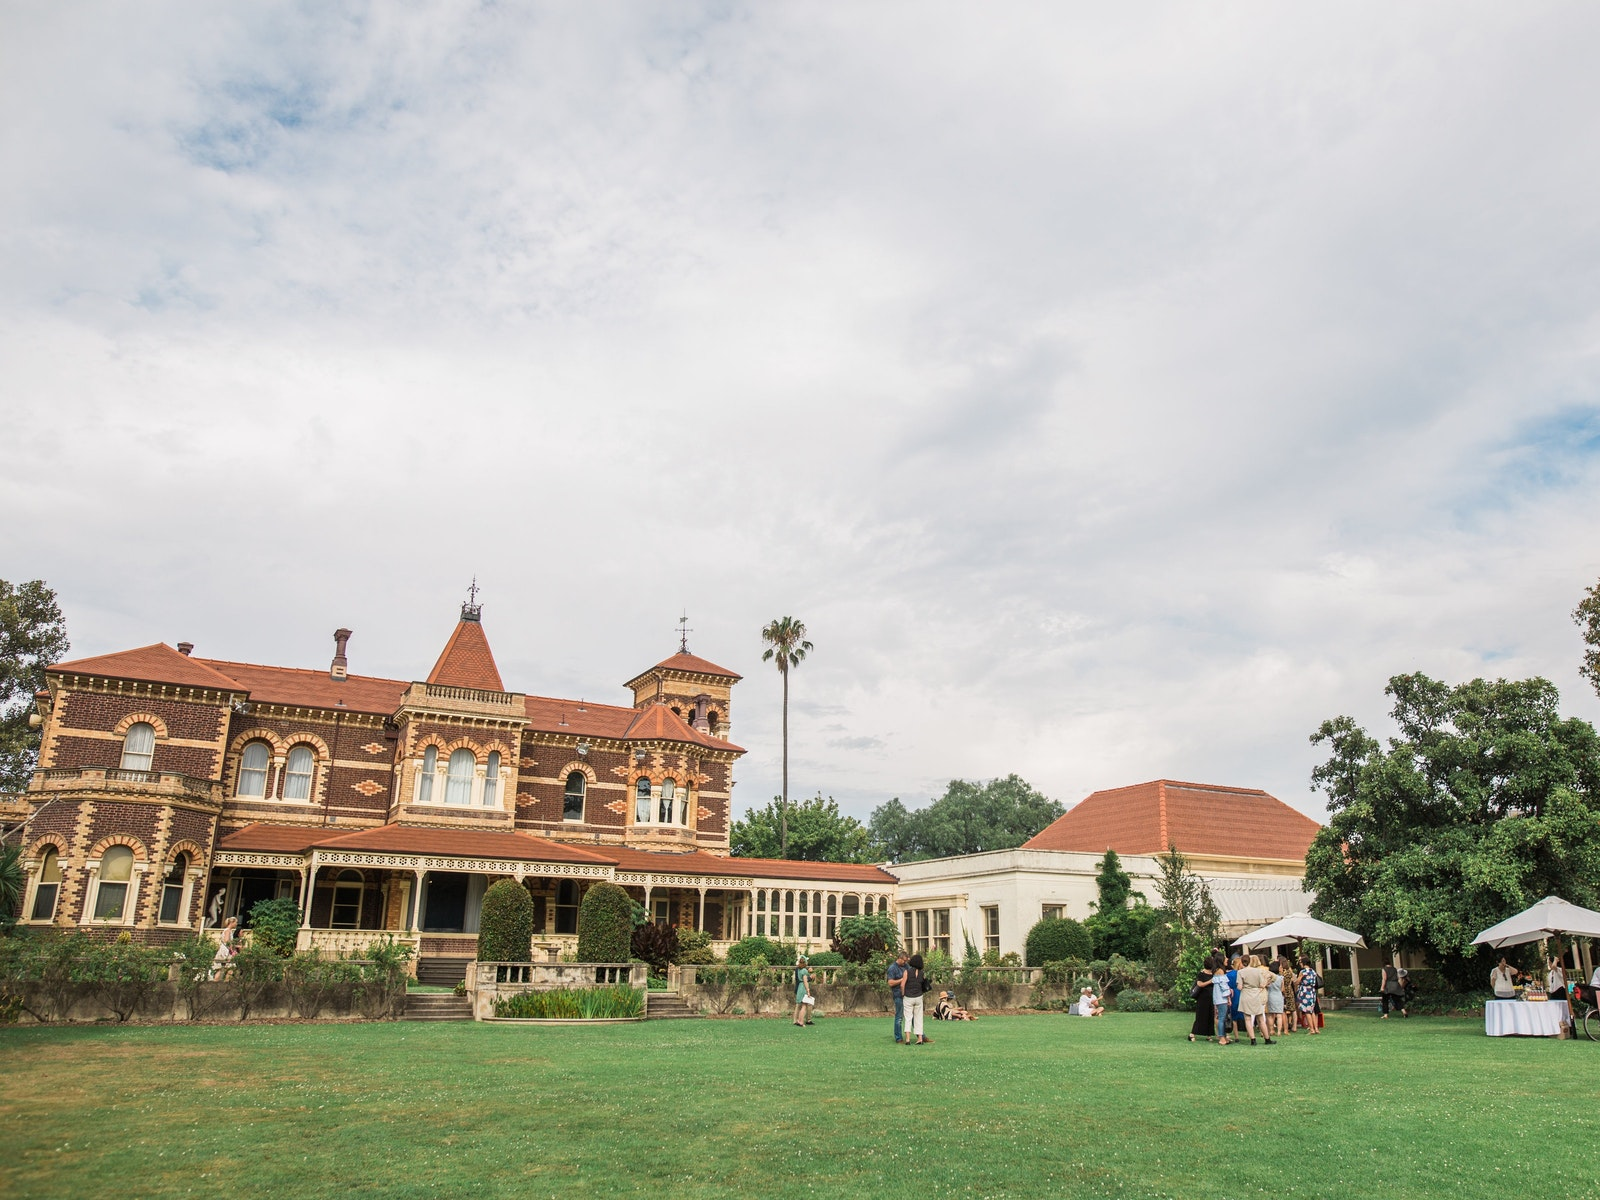 Rippon Lea Estate